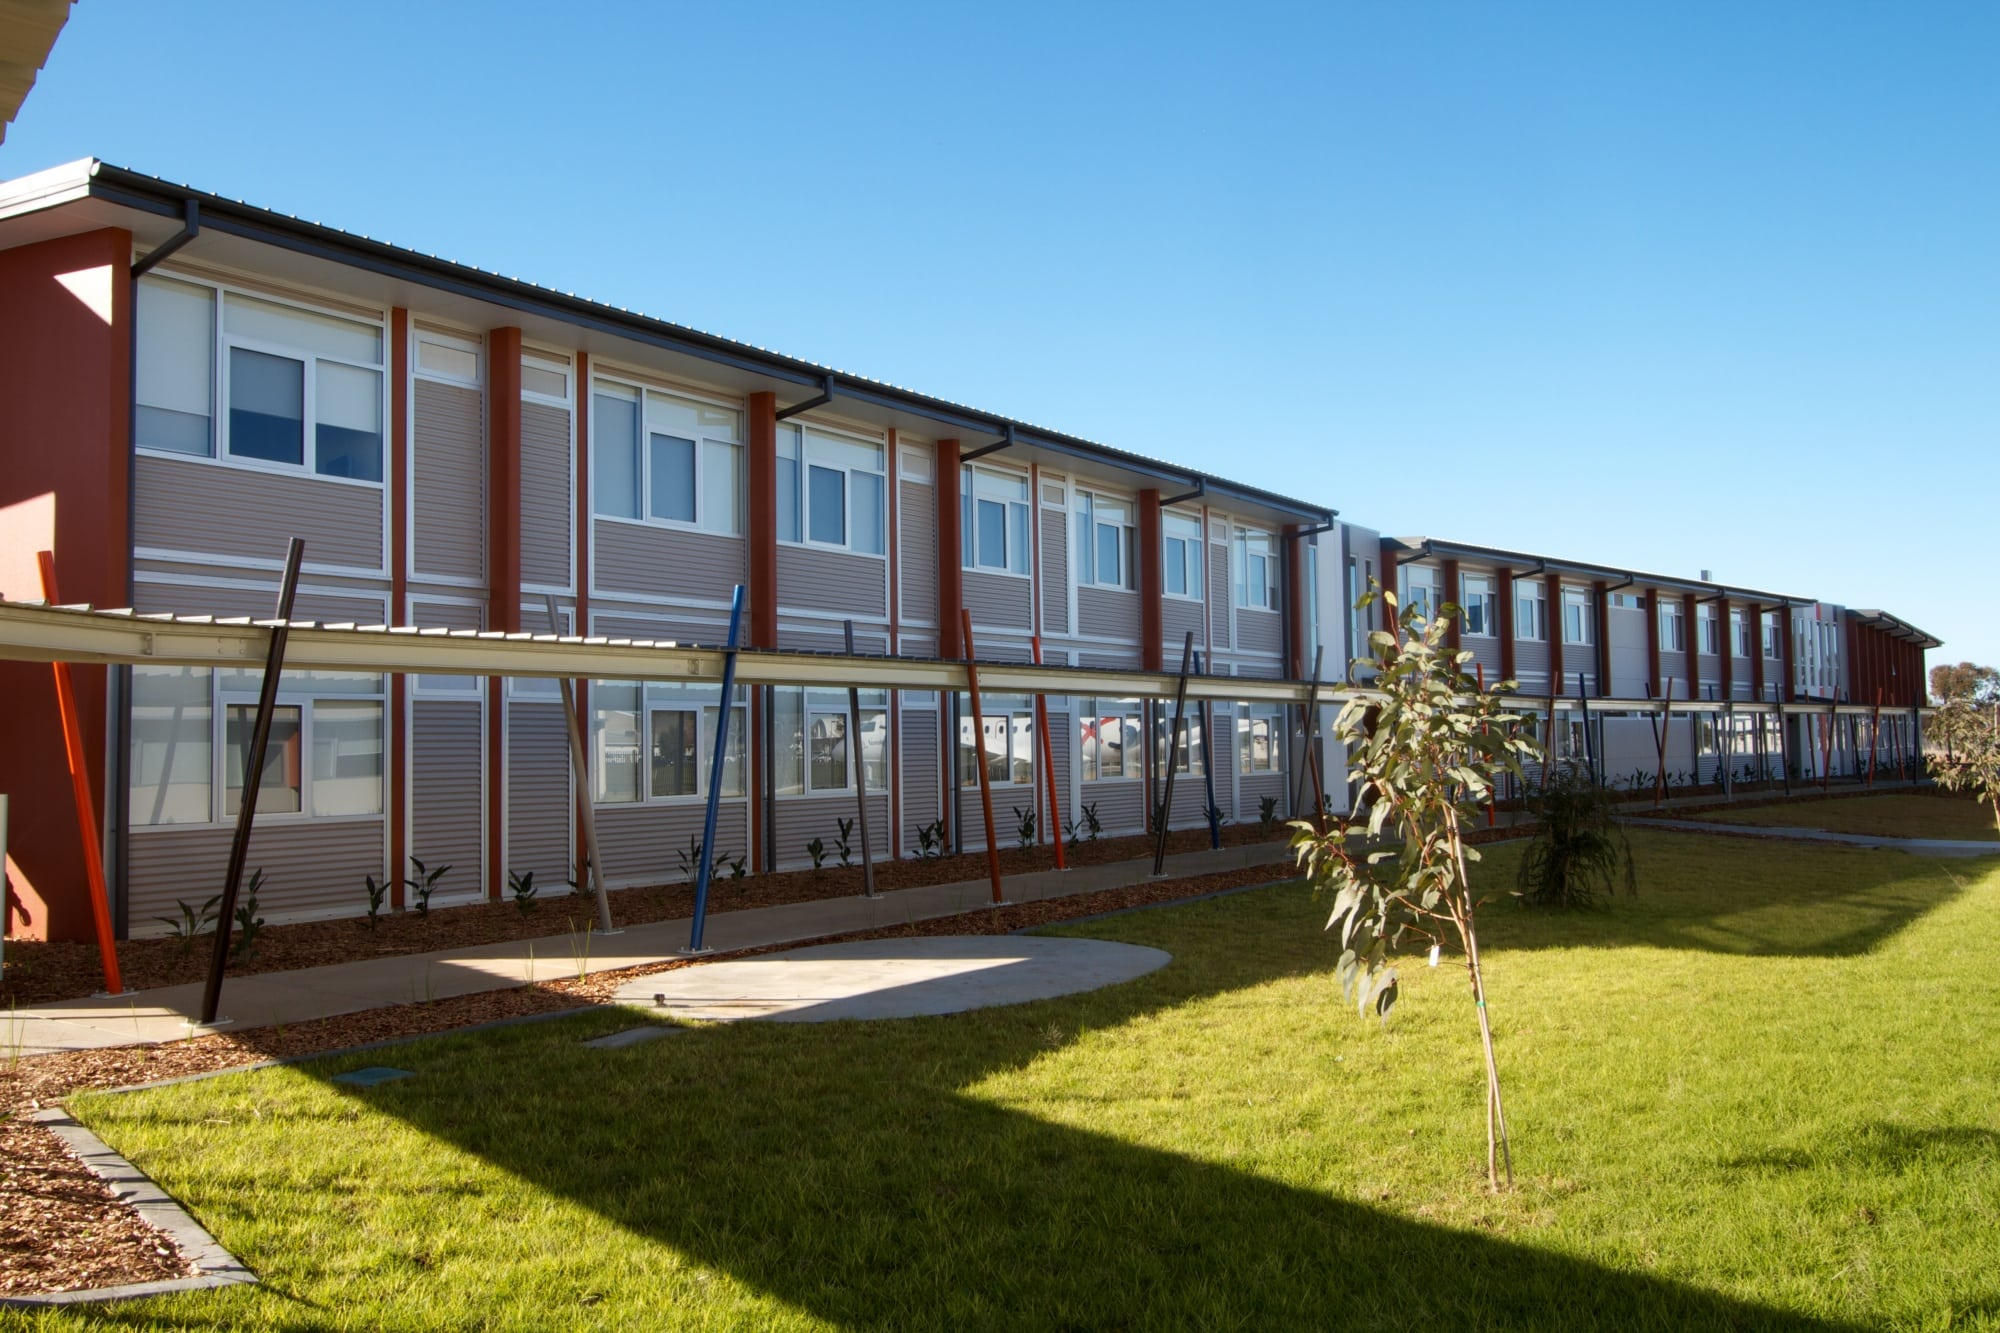 Australian Airline Training Academy - External Building